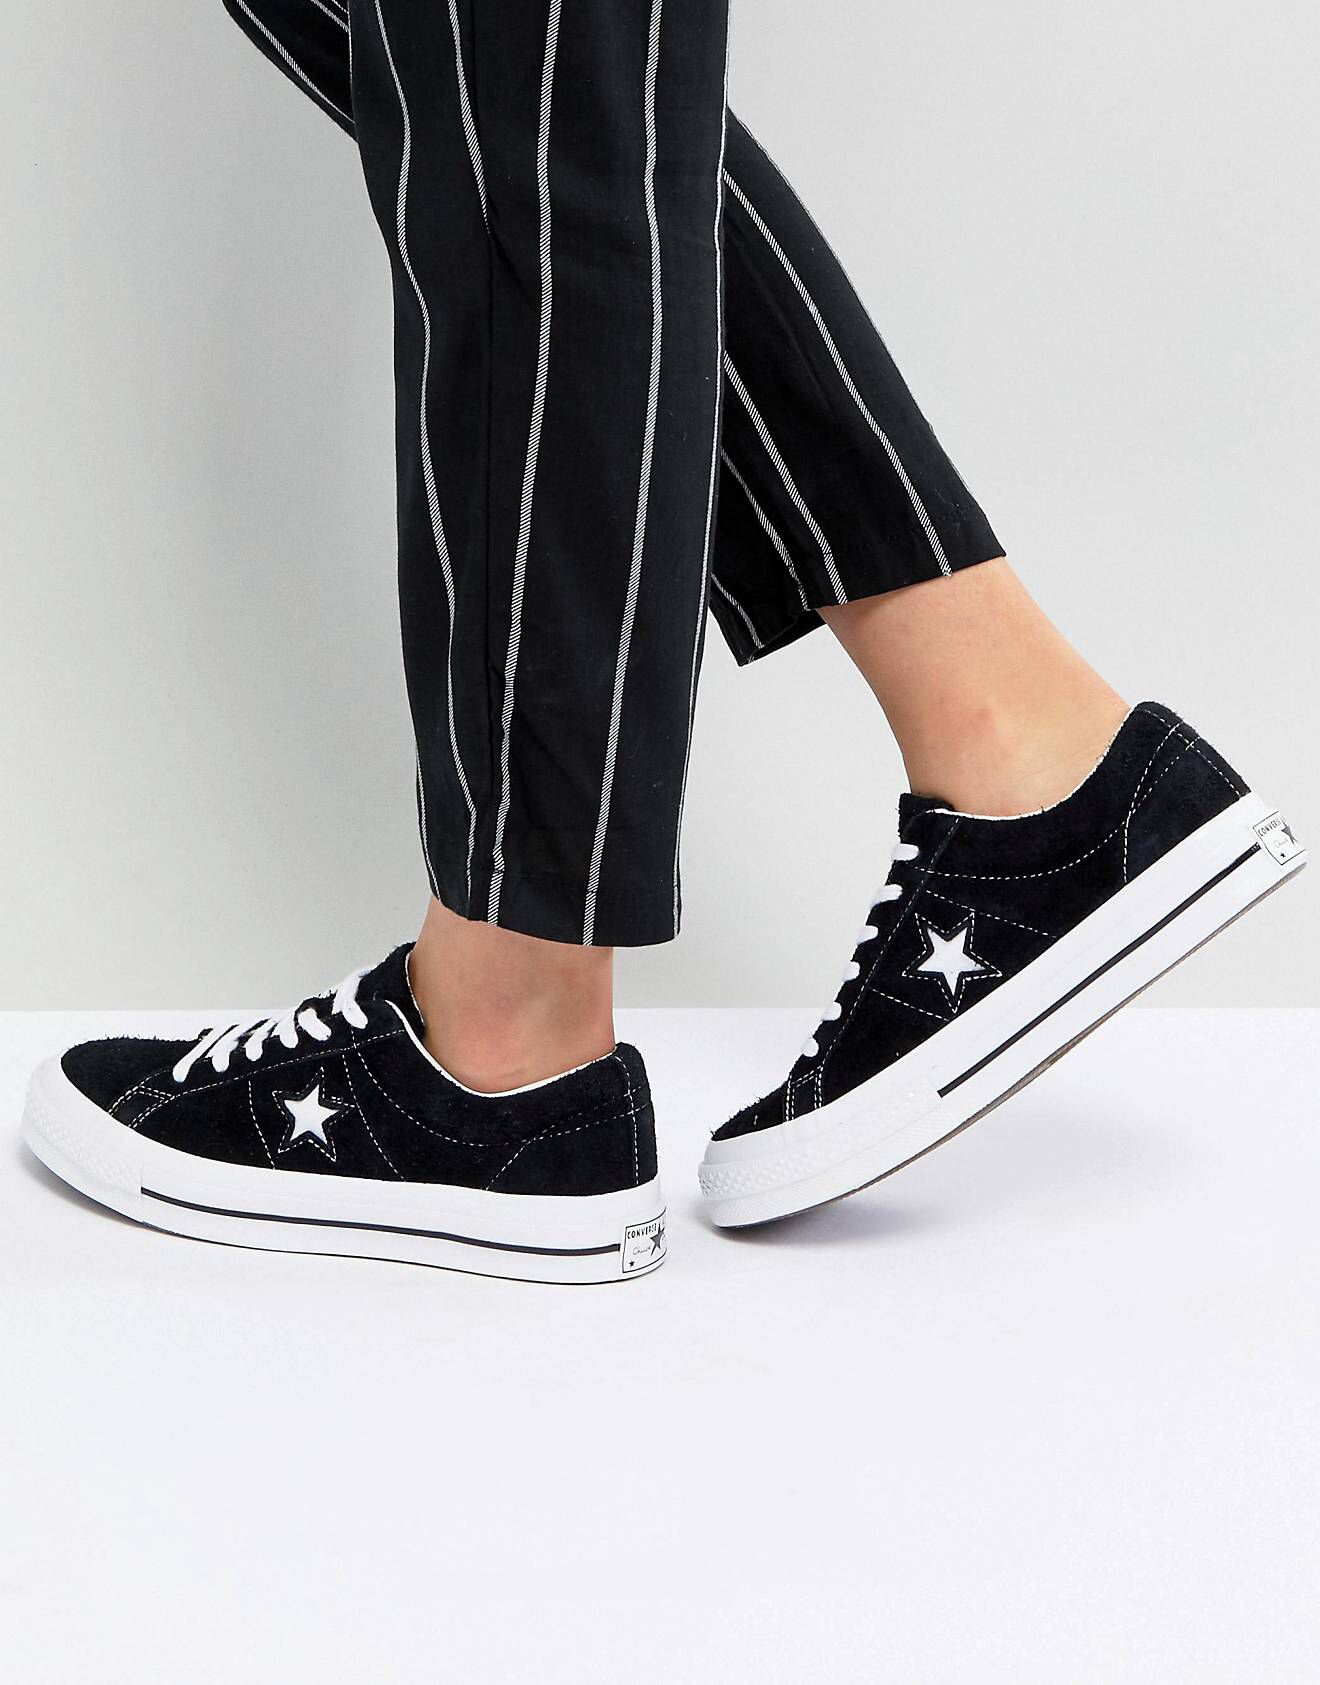 Zapatillas converse, Zapatos converse